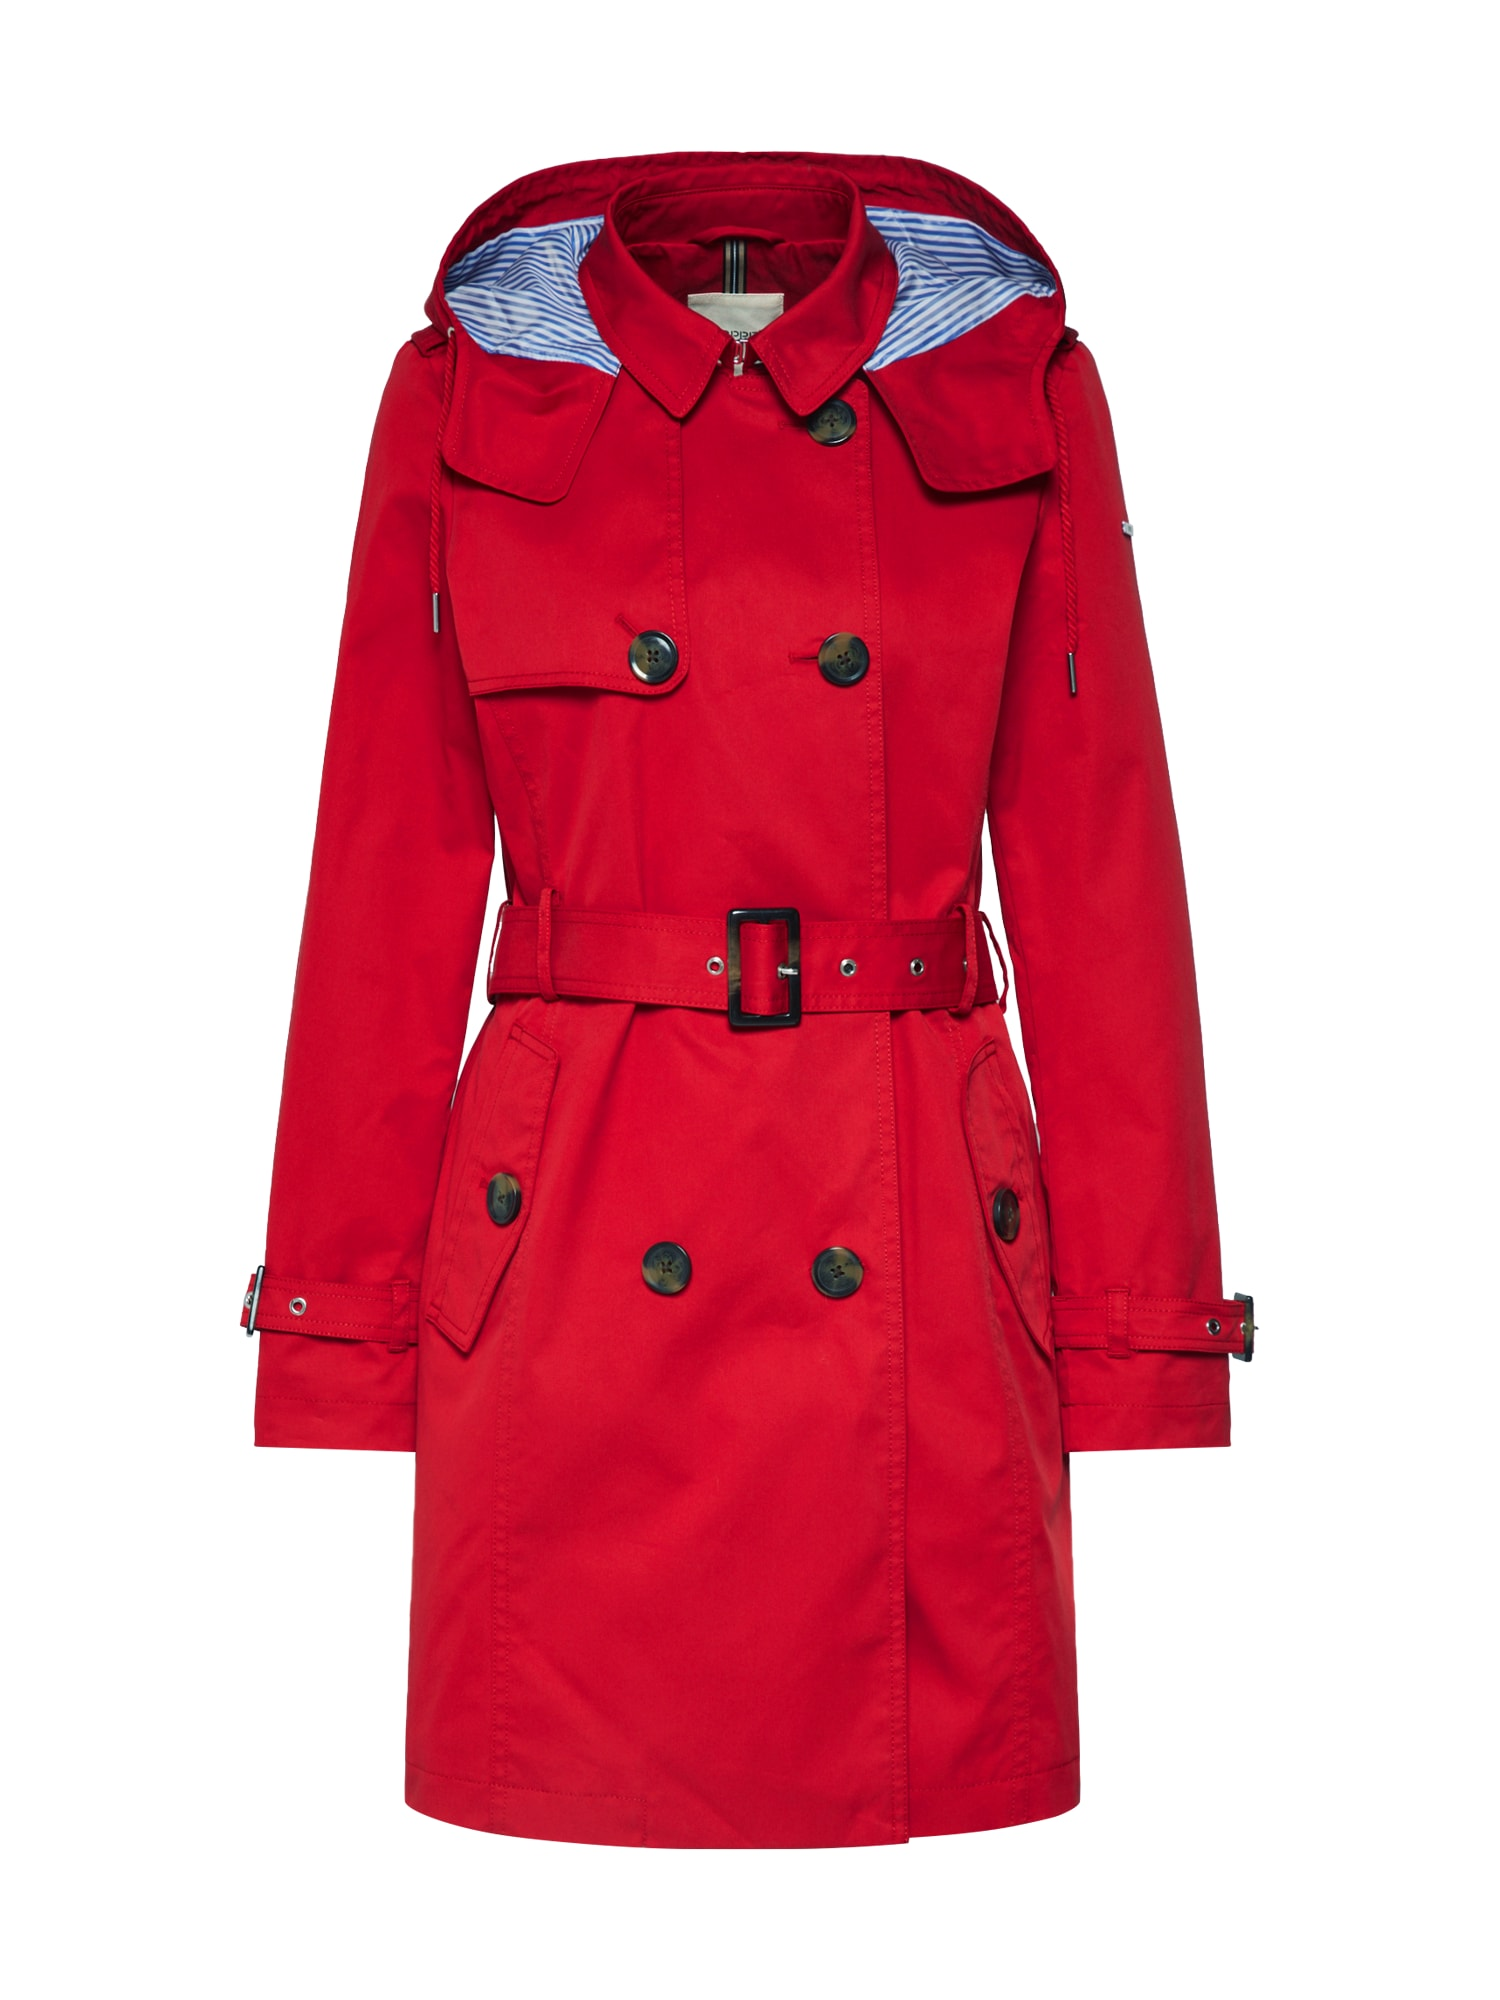 ESPRIT Rudeninis-žieminis paltas 'Classic Trench' raudona